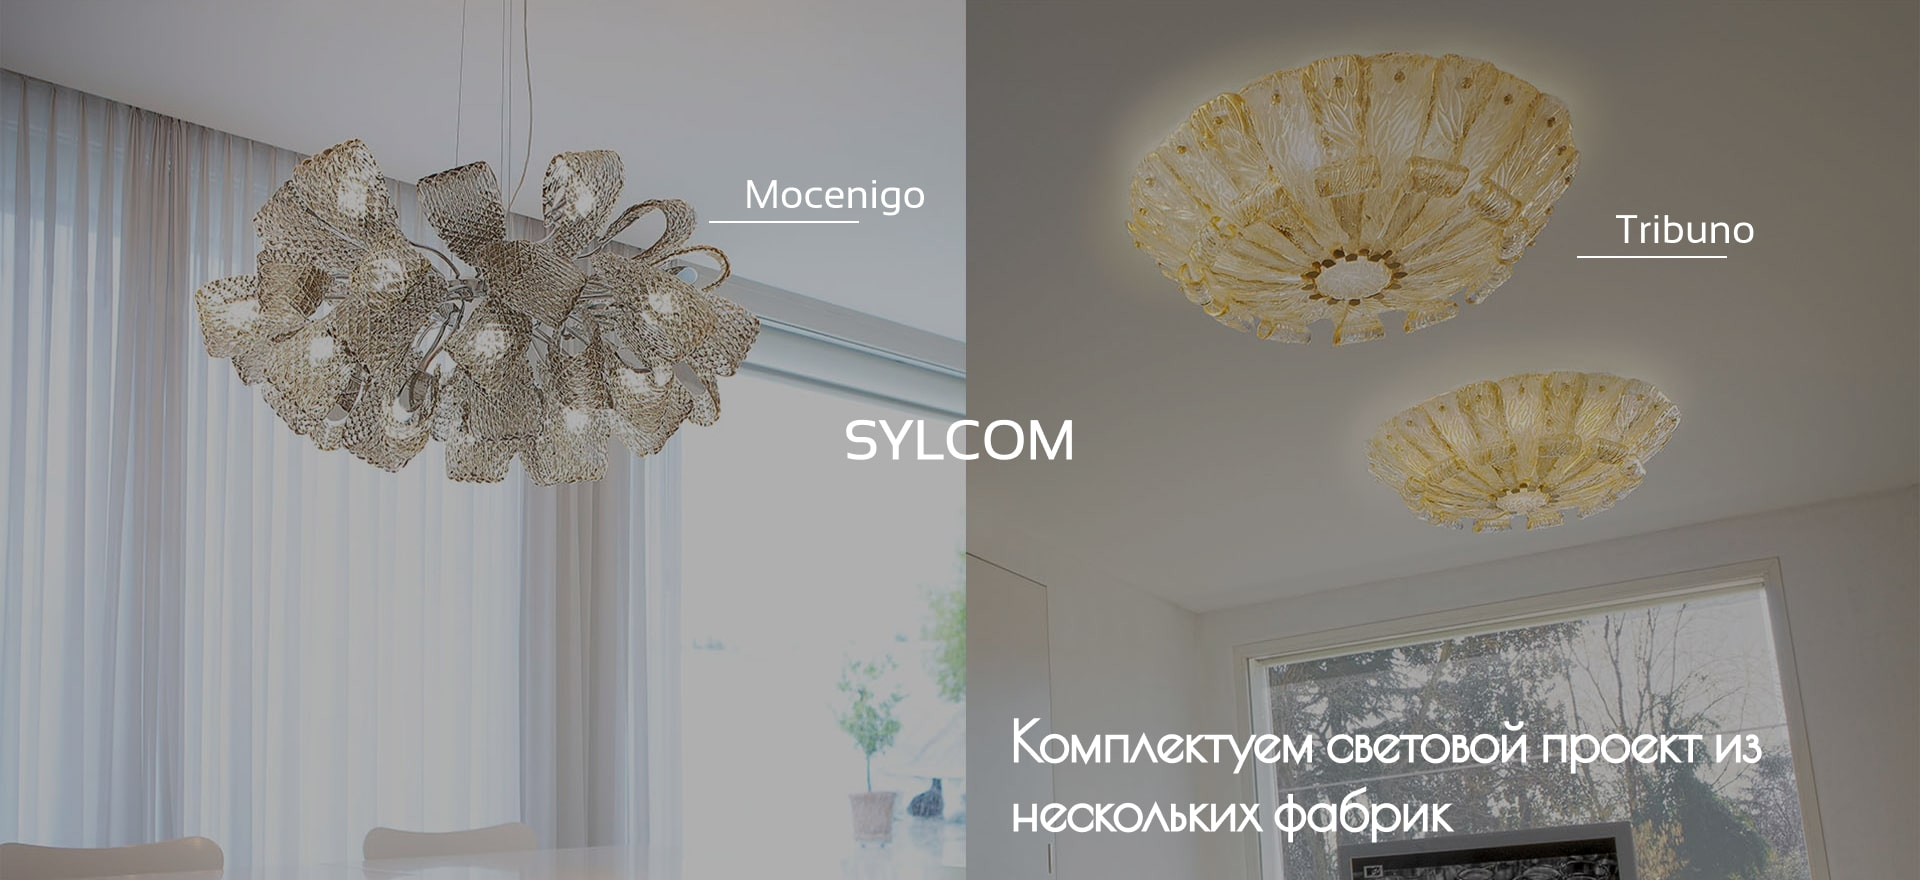 slider-sylcom